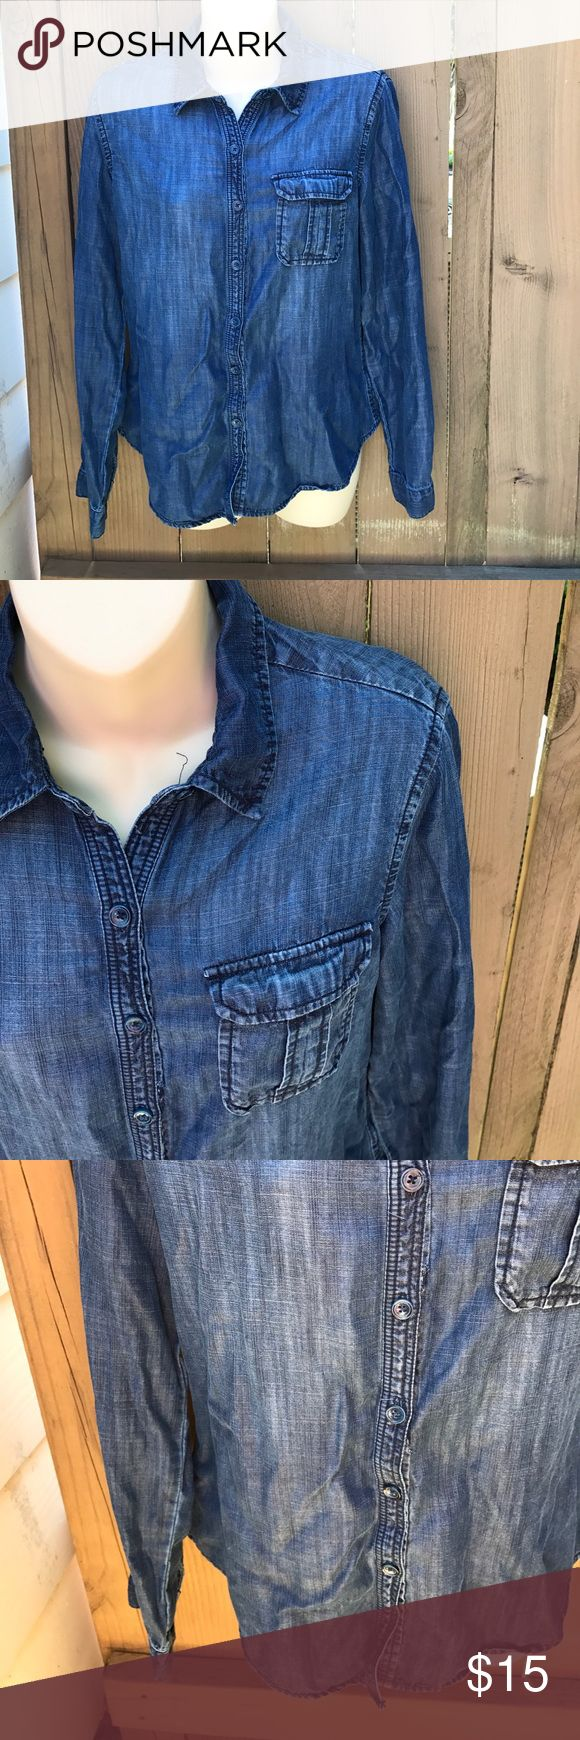 Size xs Coldwater Creek denim button down blouse Size xs Coldwater Creek denim button down blouse Coldwater Creek Tops Button Down Shirts